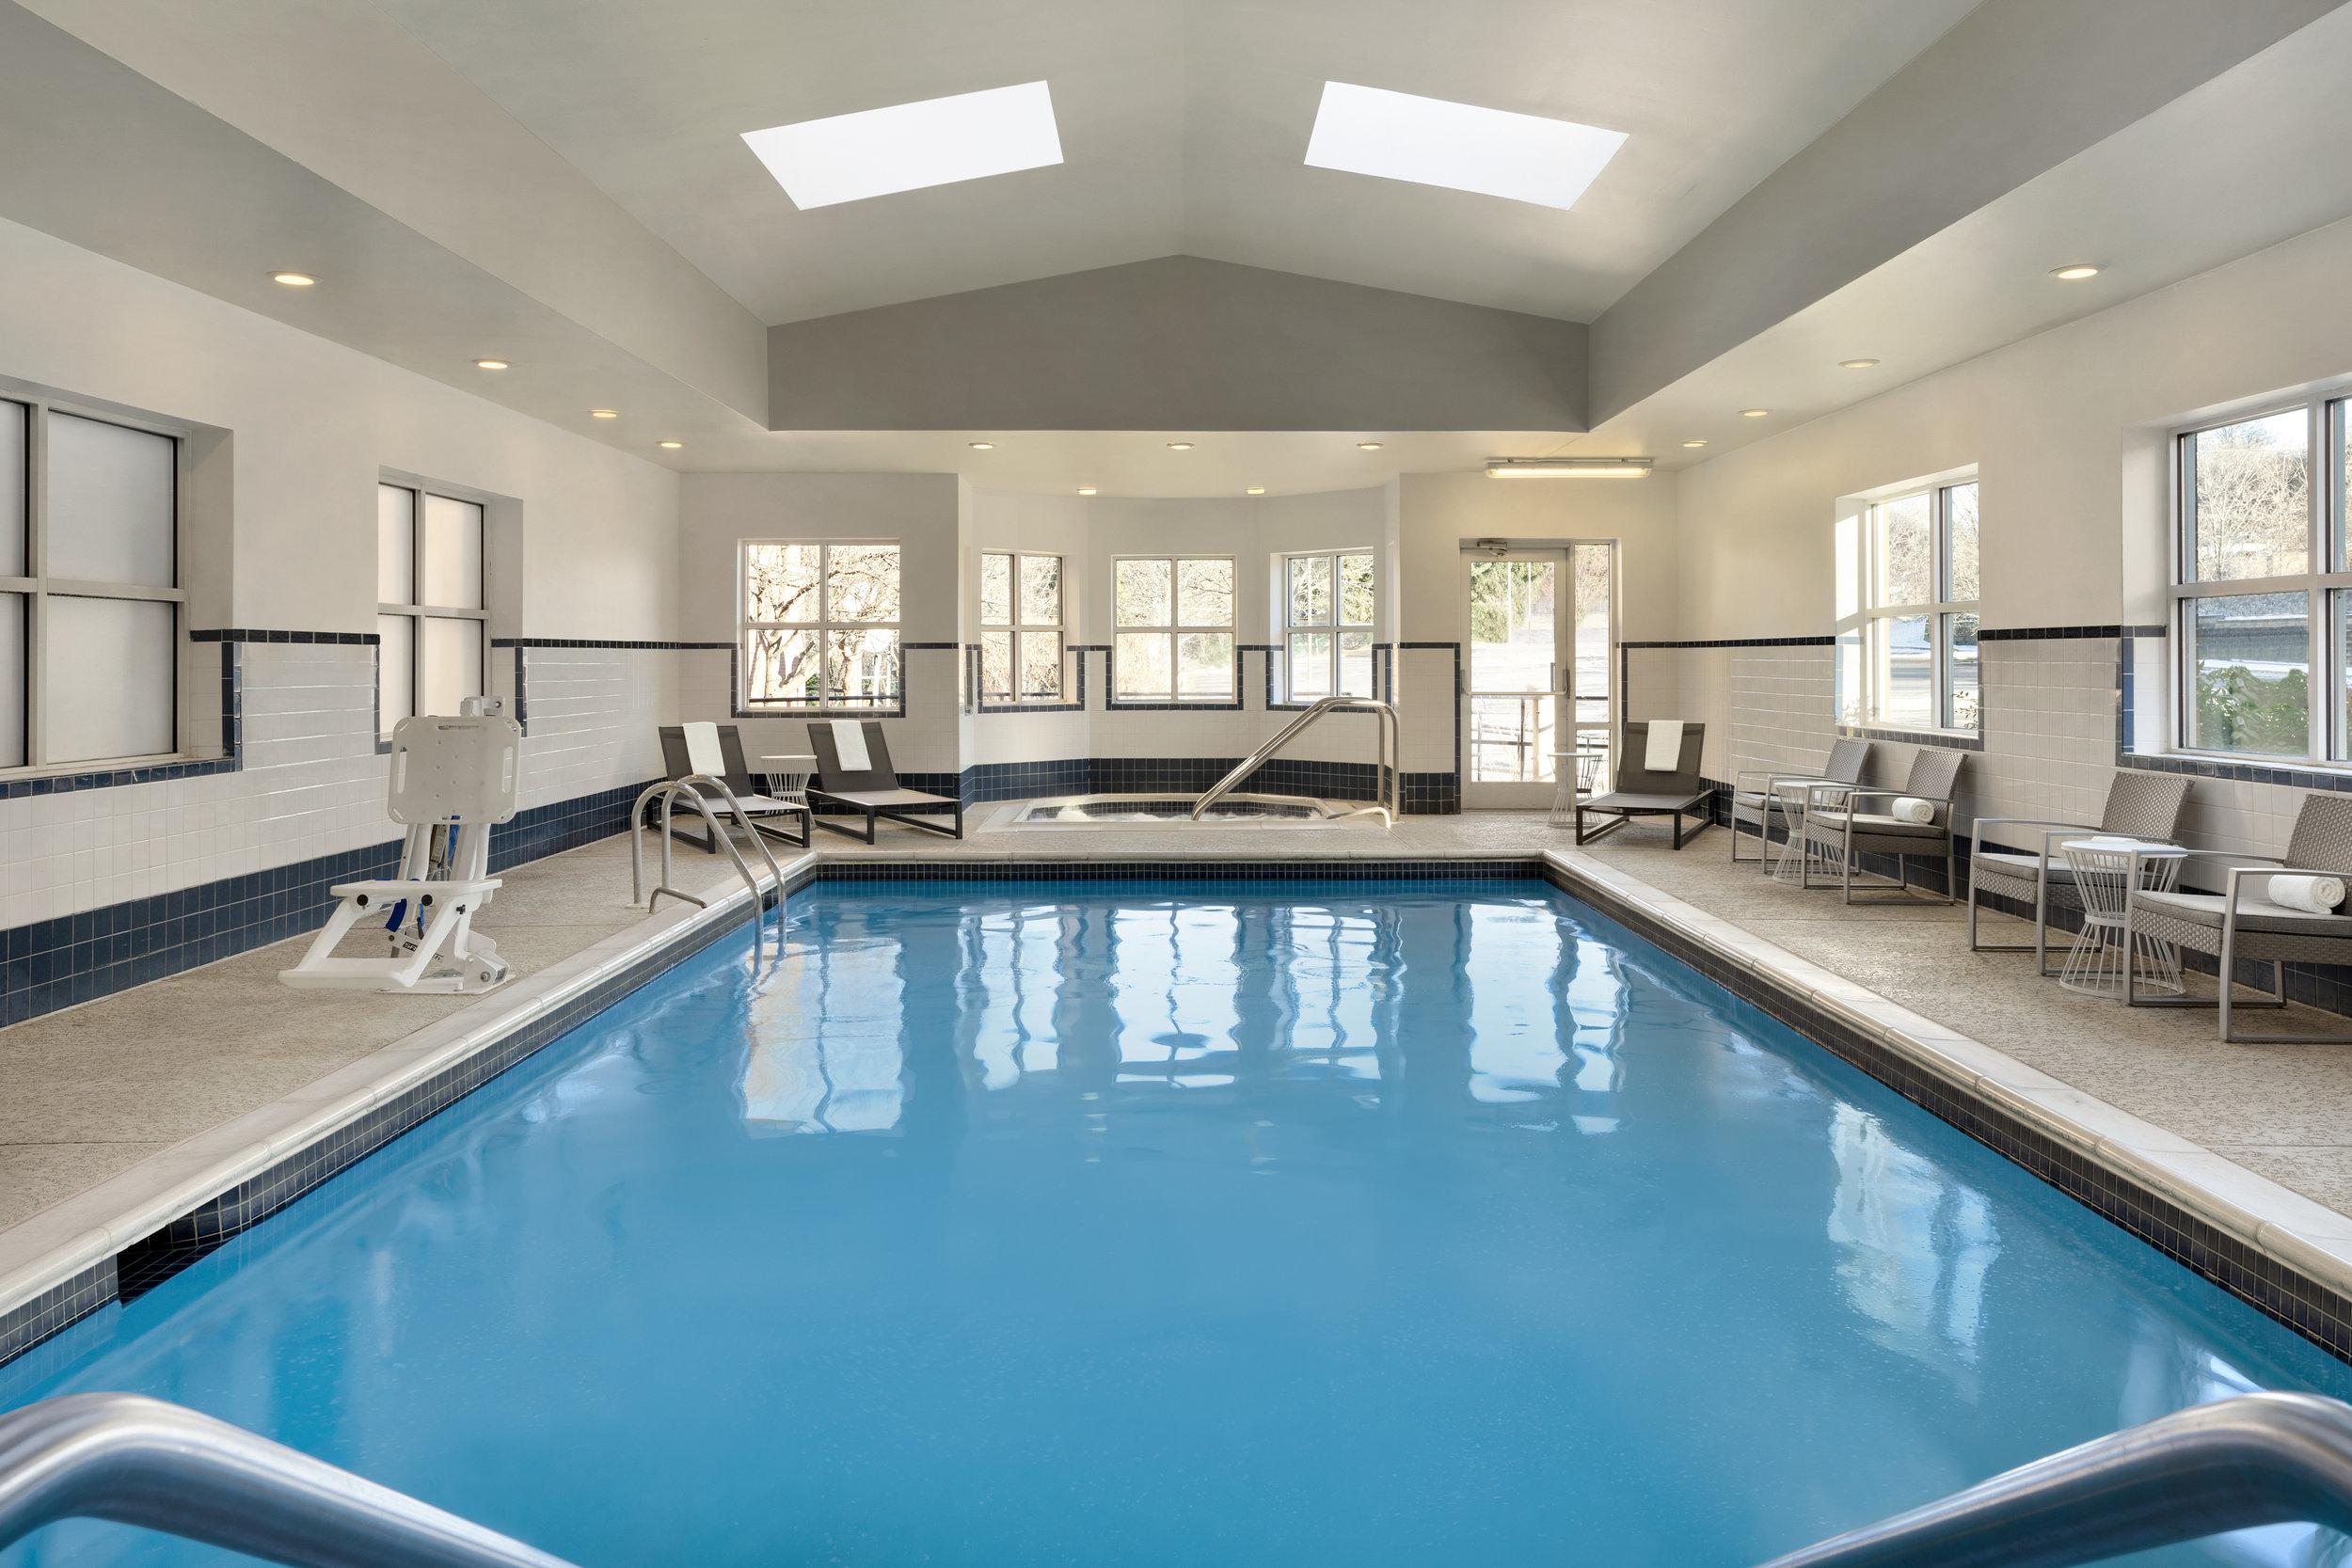 Hyatt-Place-Philadelphia-King-of-Prussia-Pool.jpg